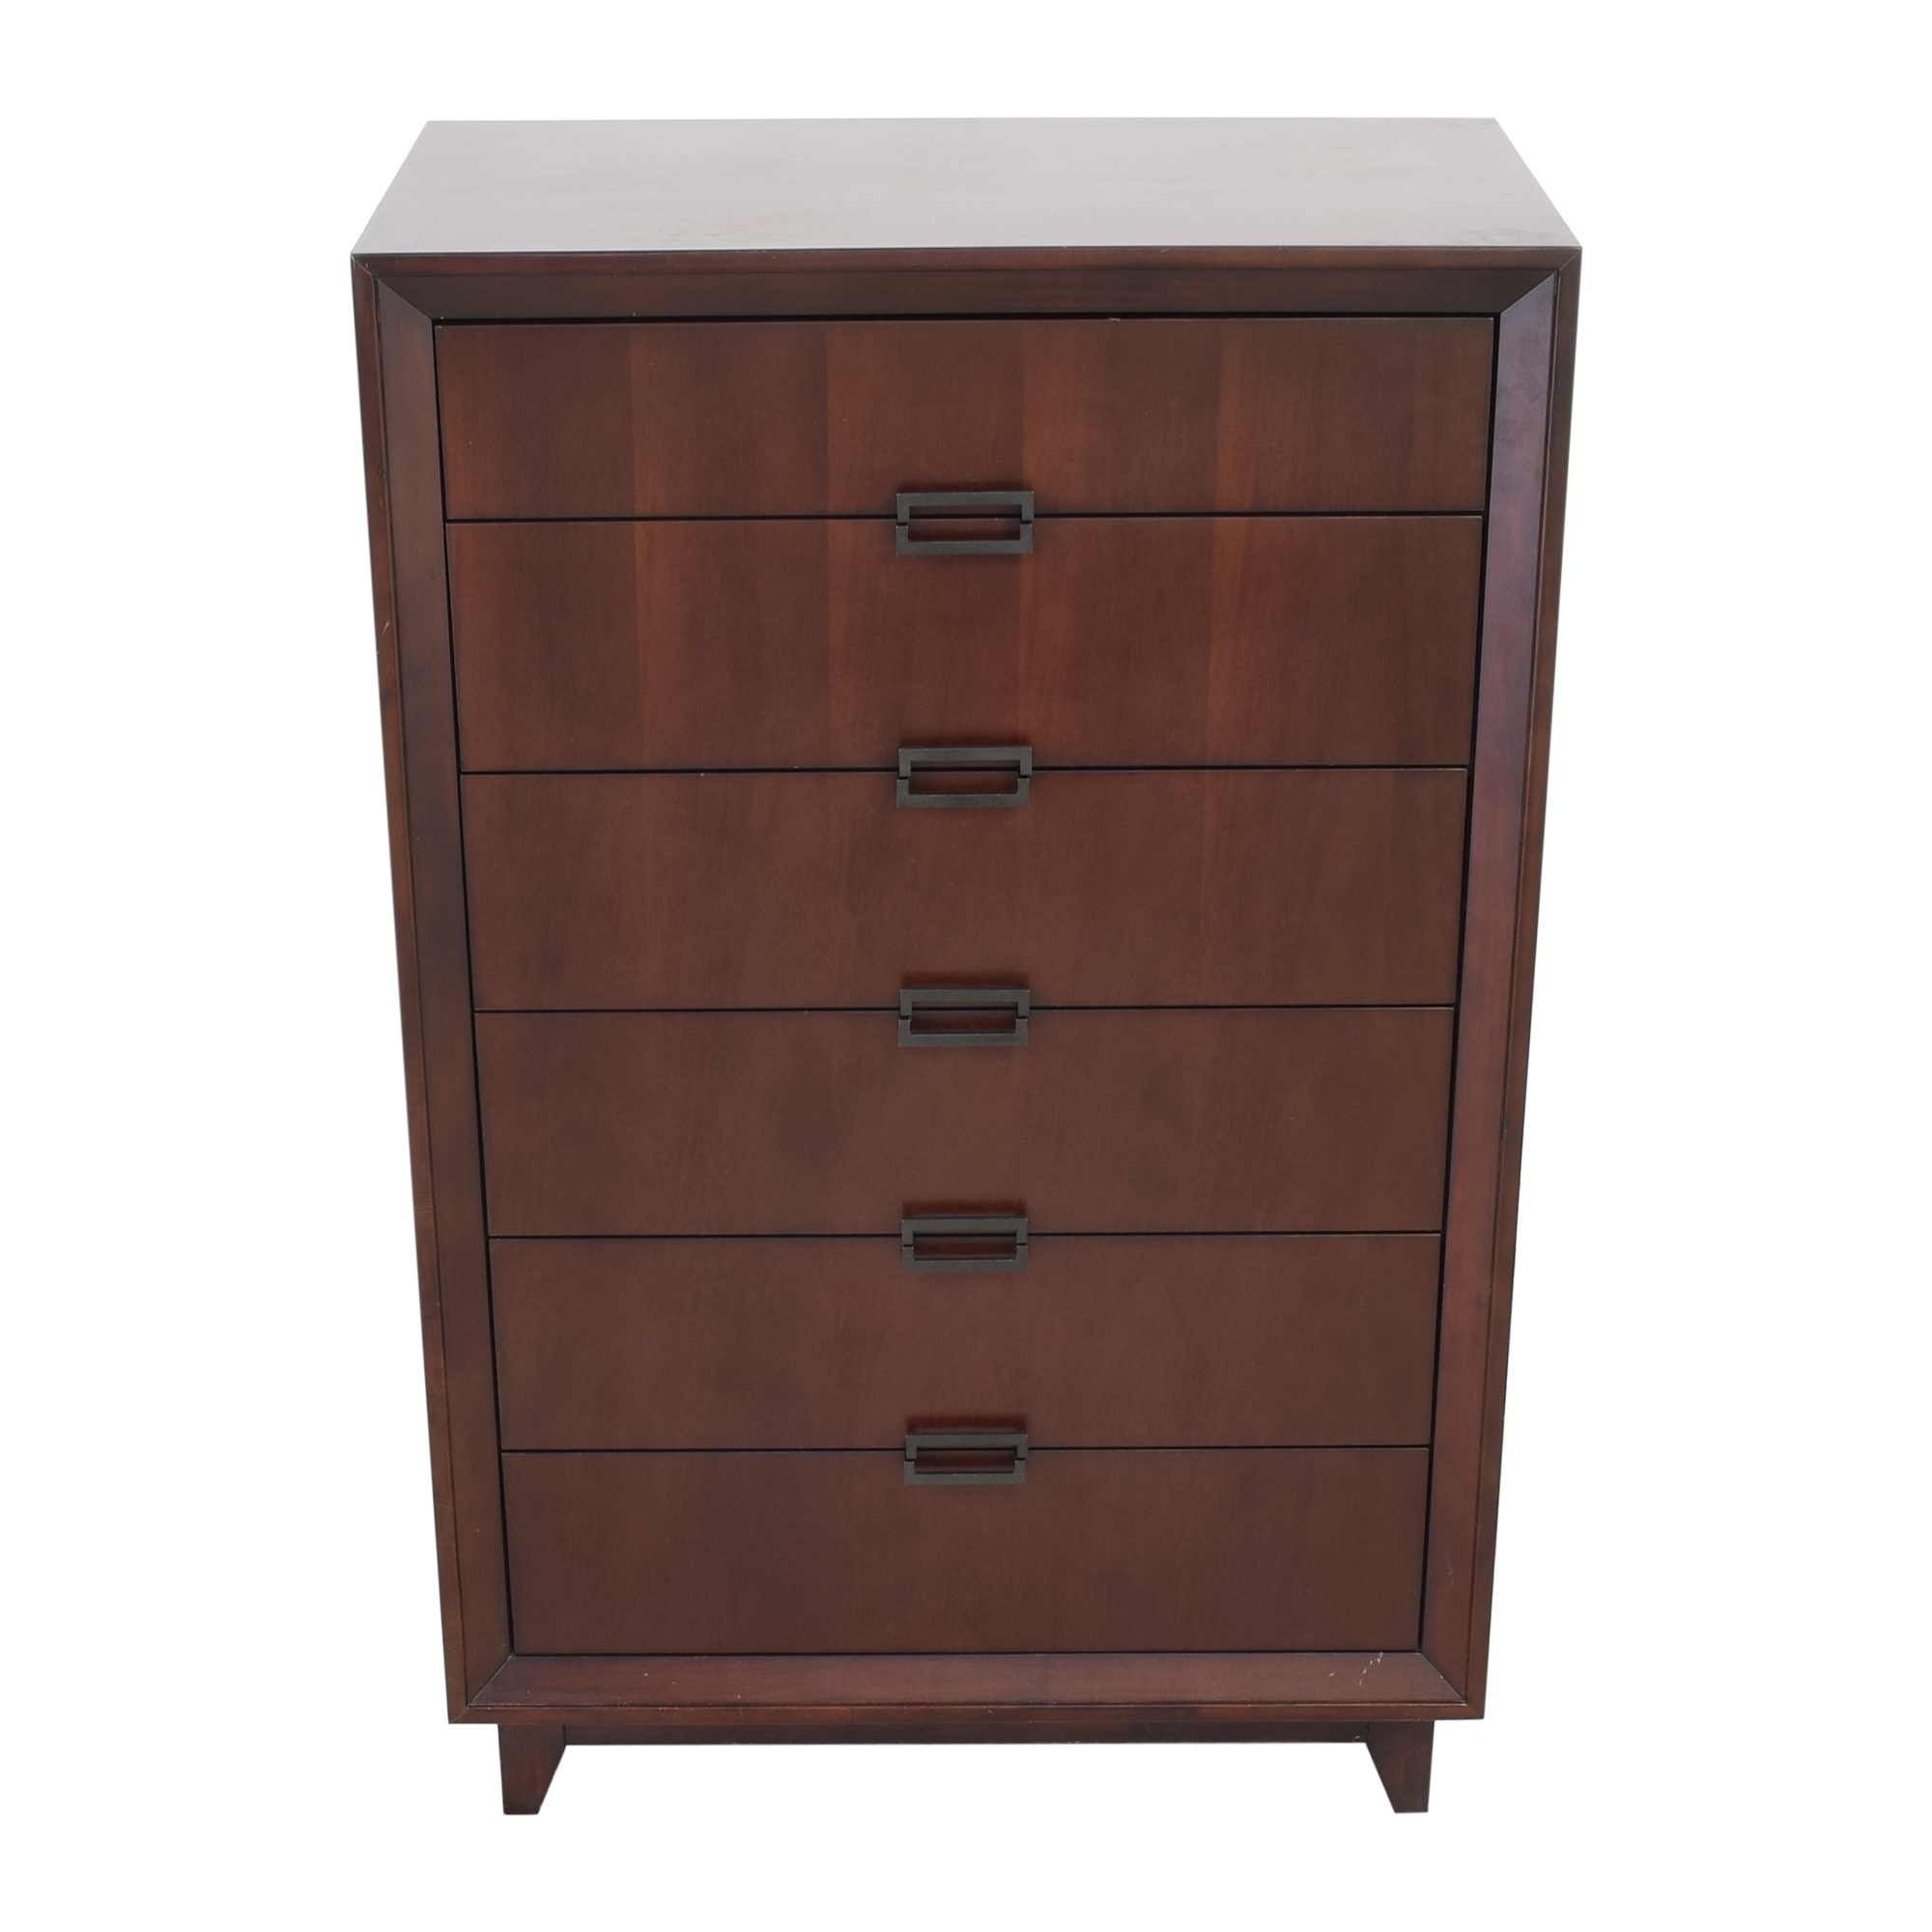 Casana Furniture Casana Vista Bedroom Chest nj